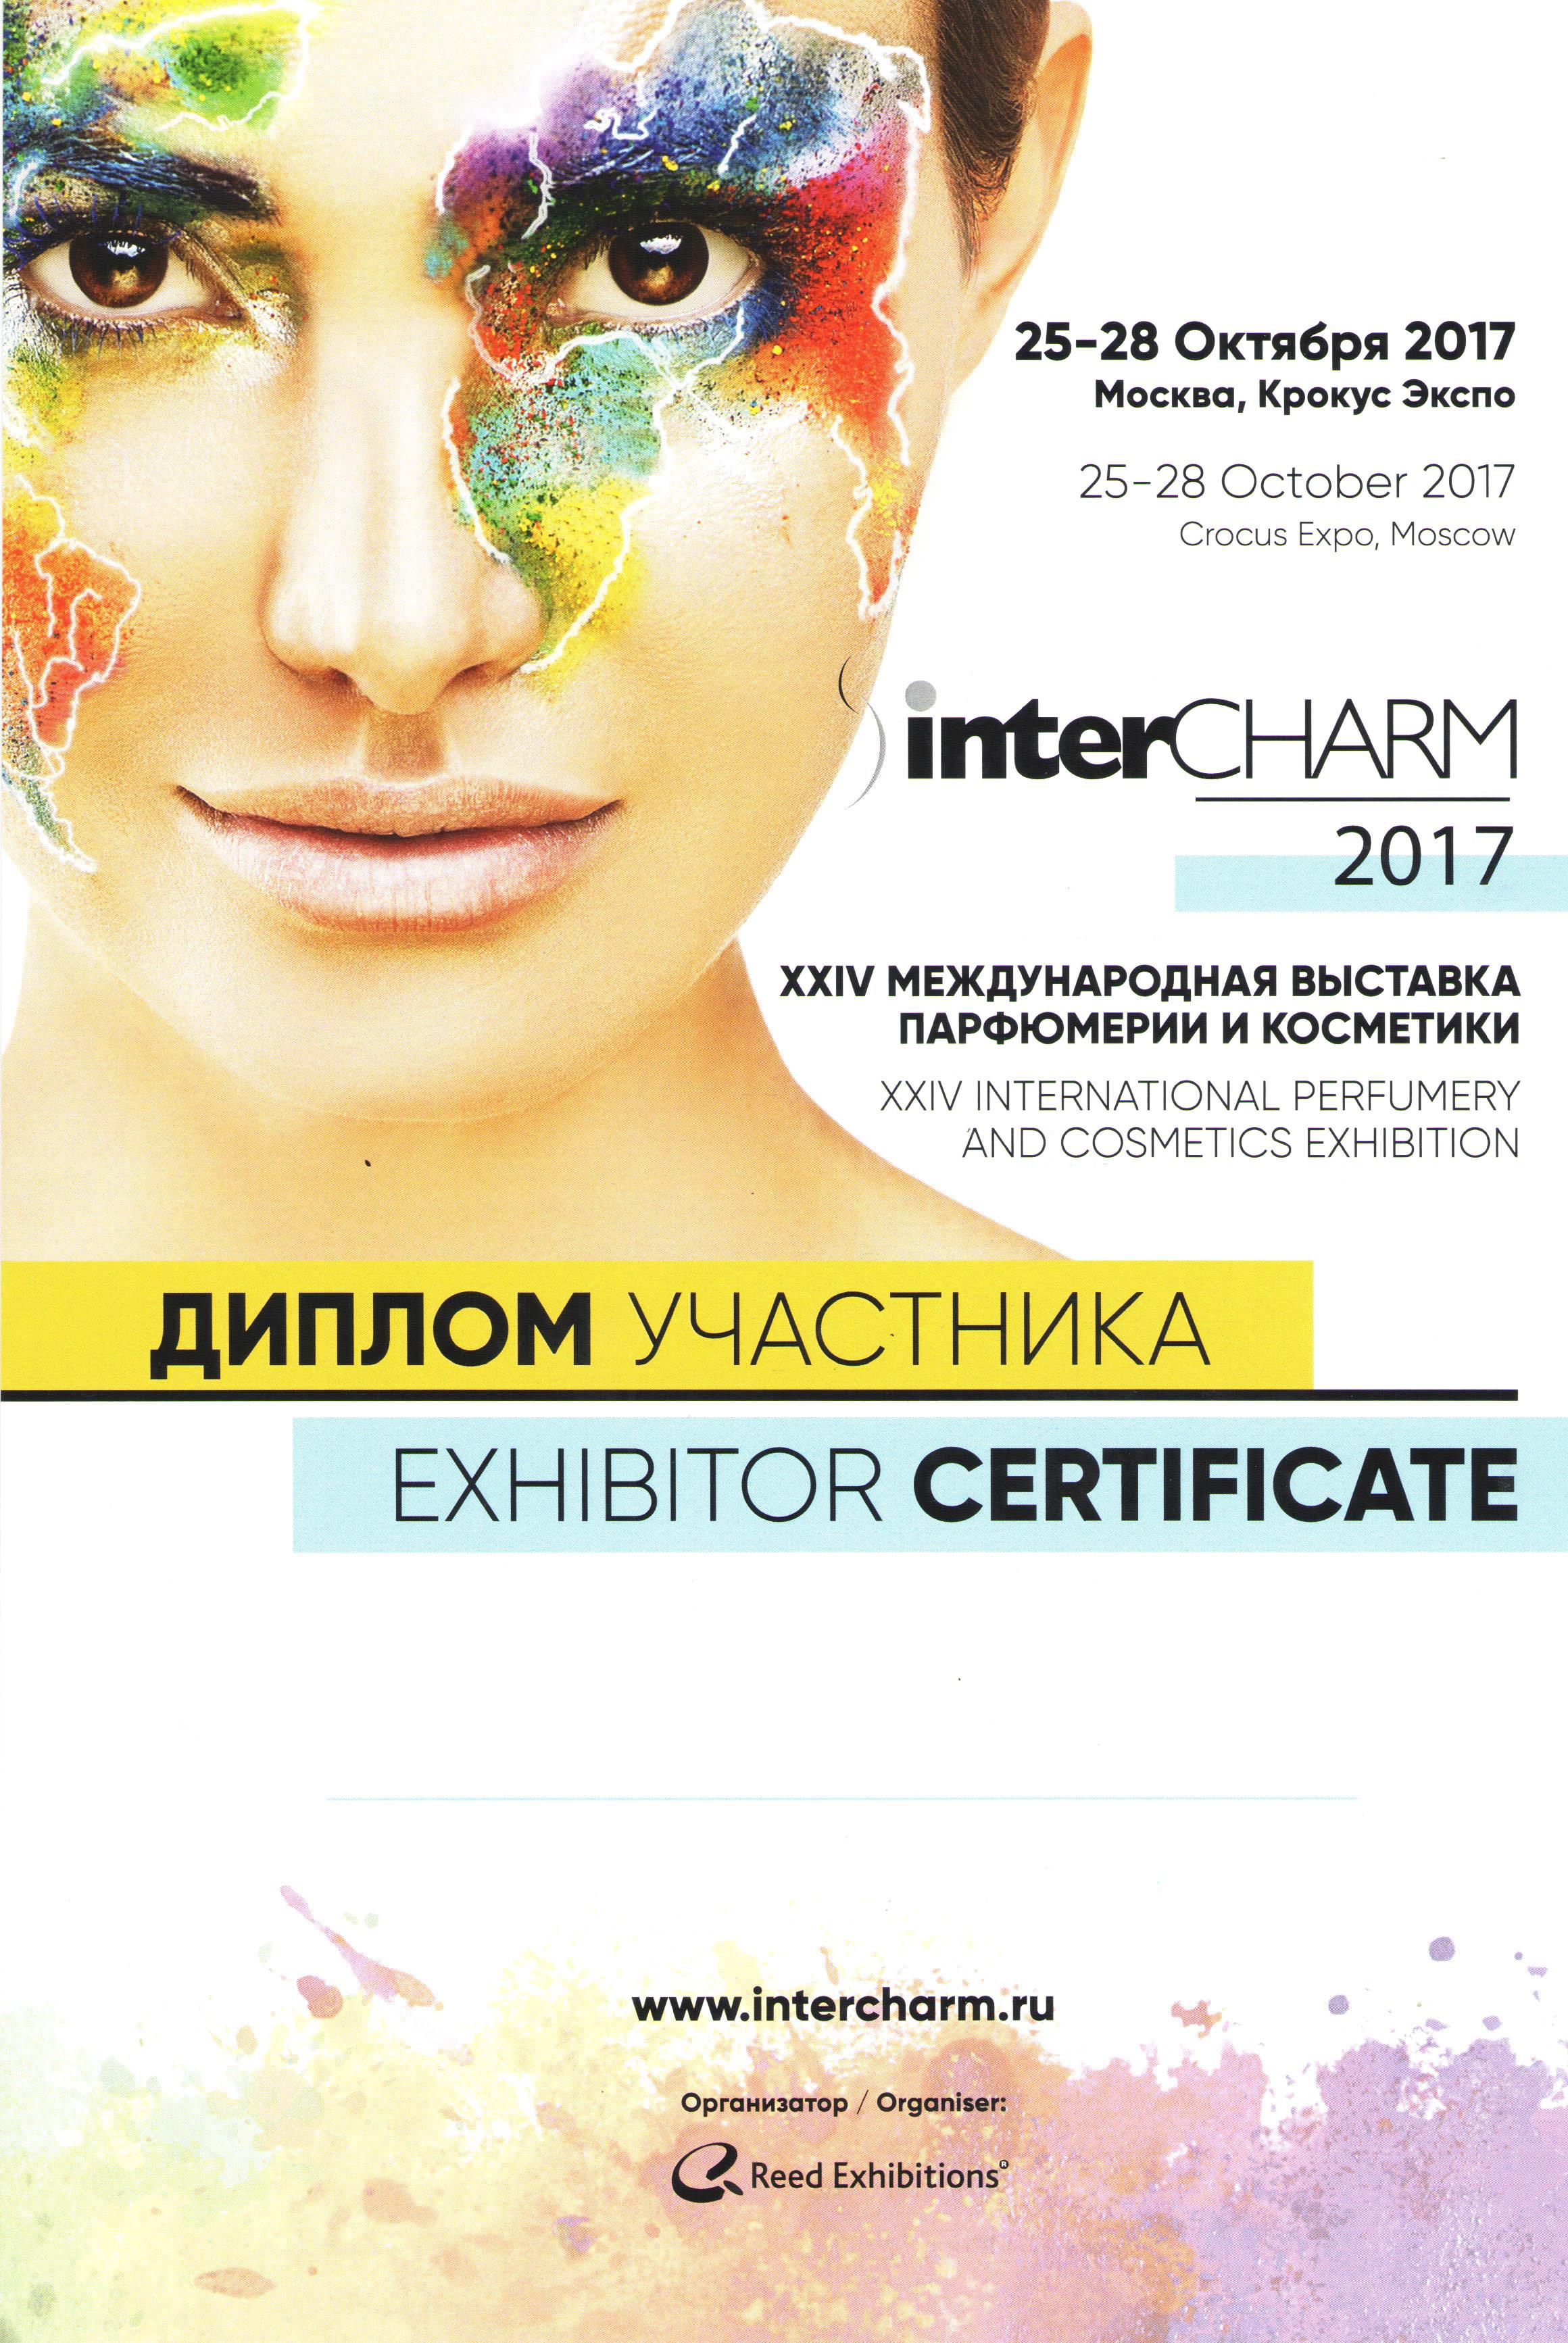 intercharm2017.jpg